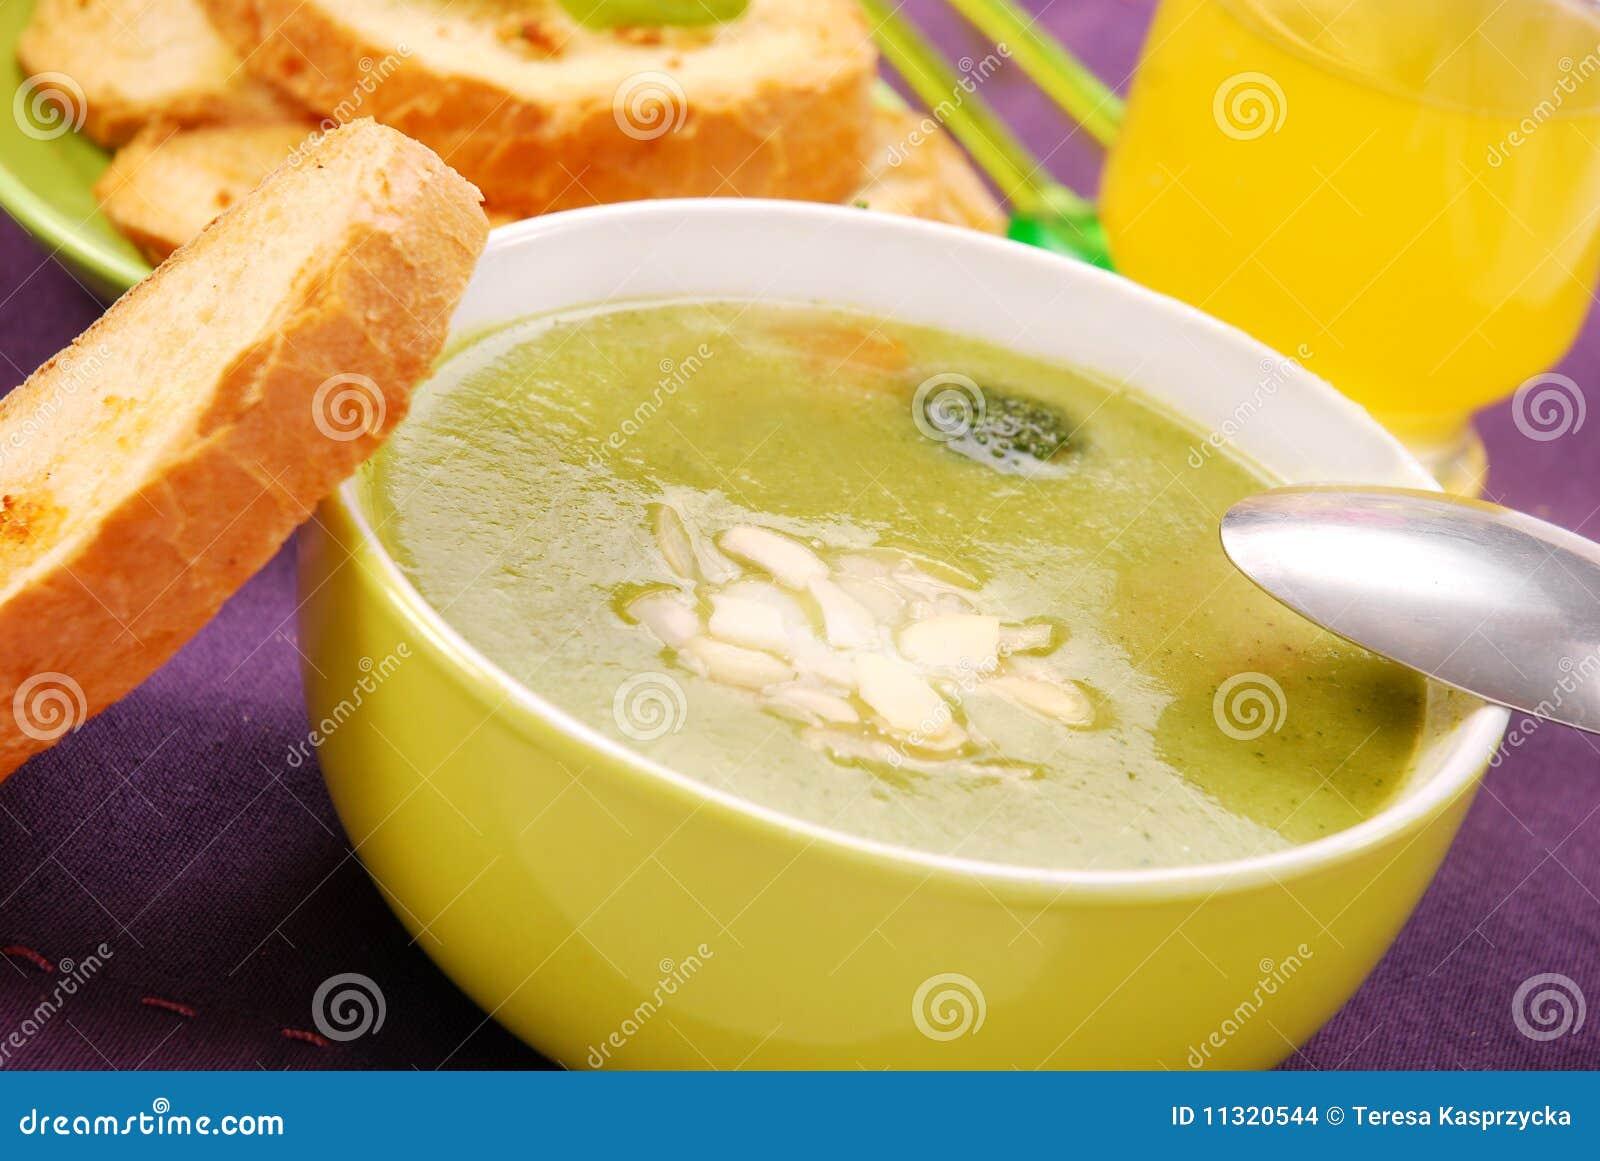 Brokkolisuppe mit Mandeln